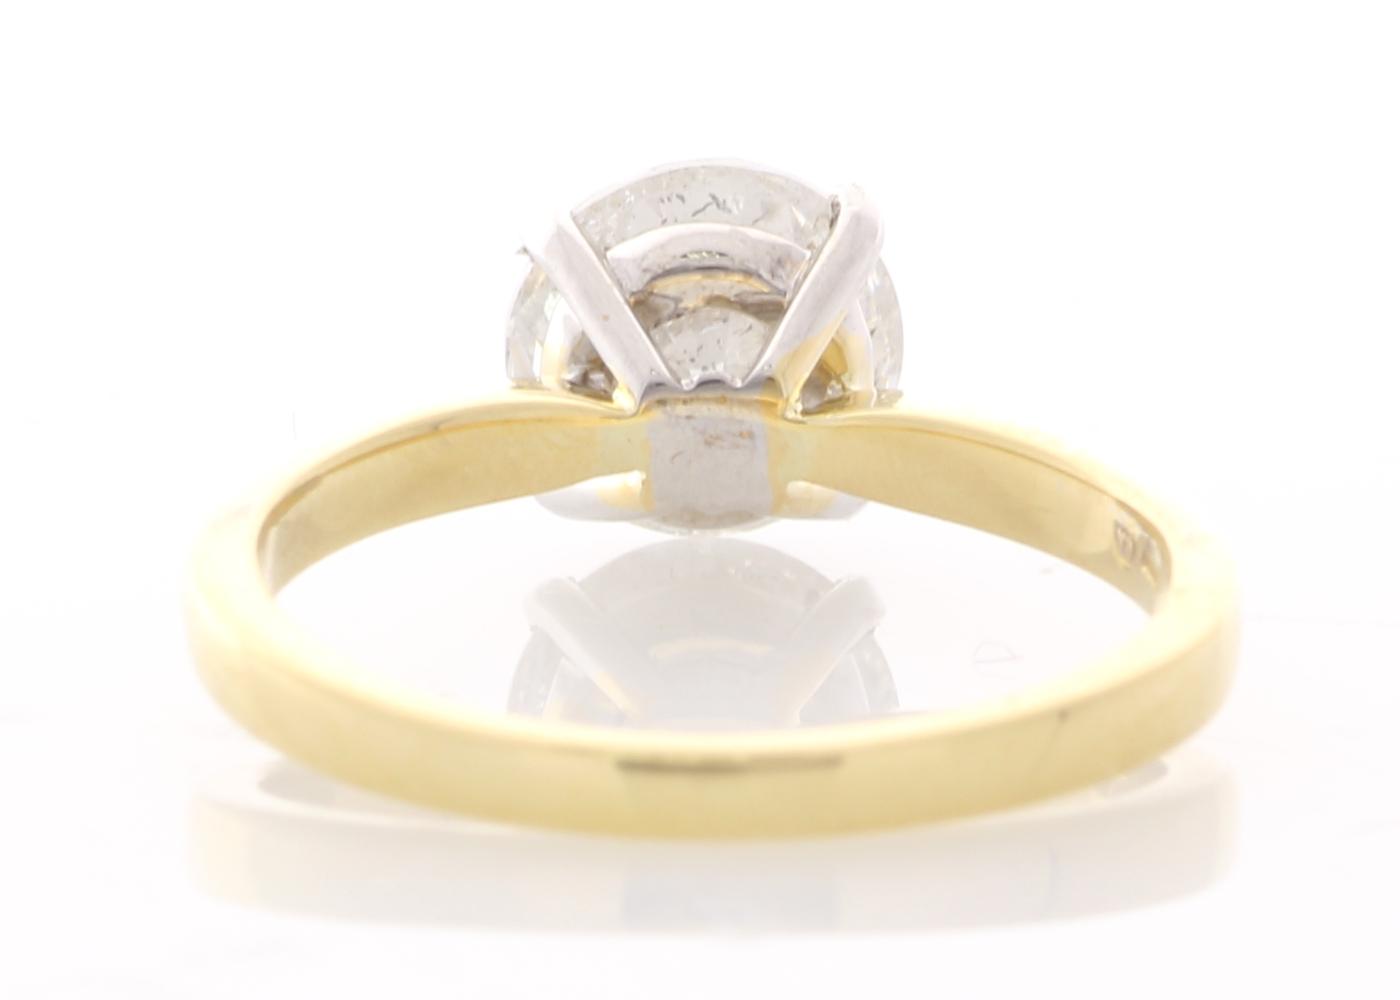 18ct Yellow Gold Single Stone Prong Set Diamond Ring 2.00 Carats - Image 3 of 5